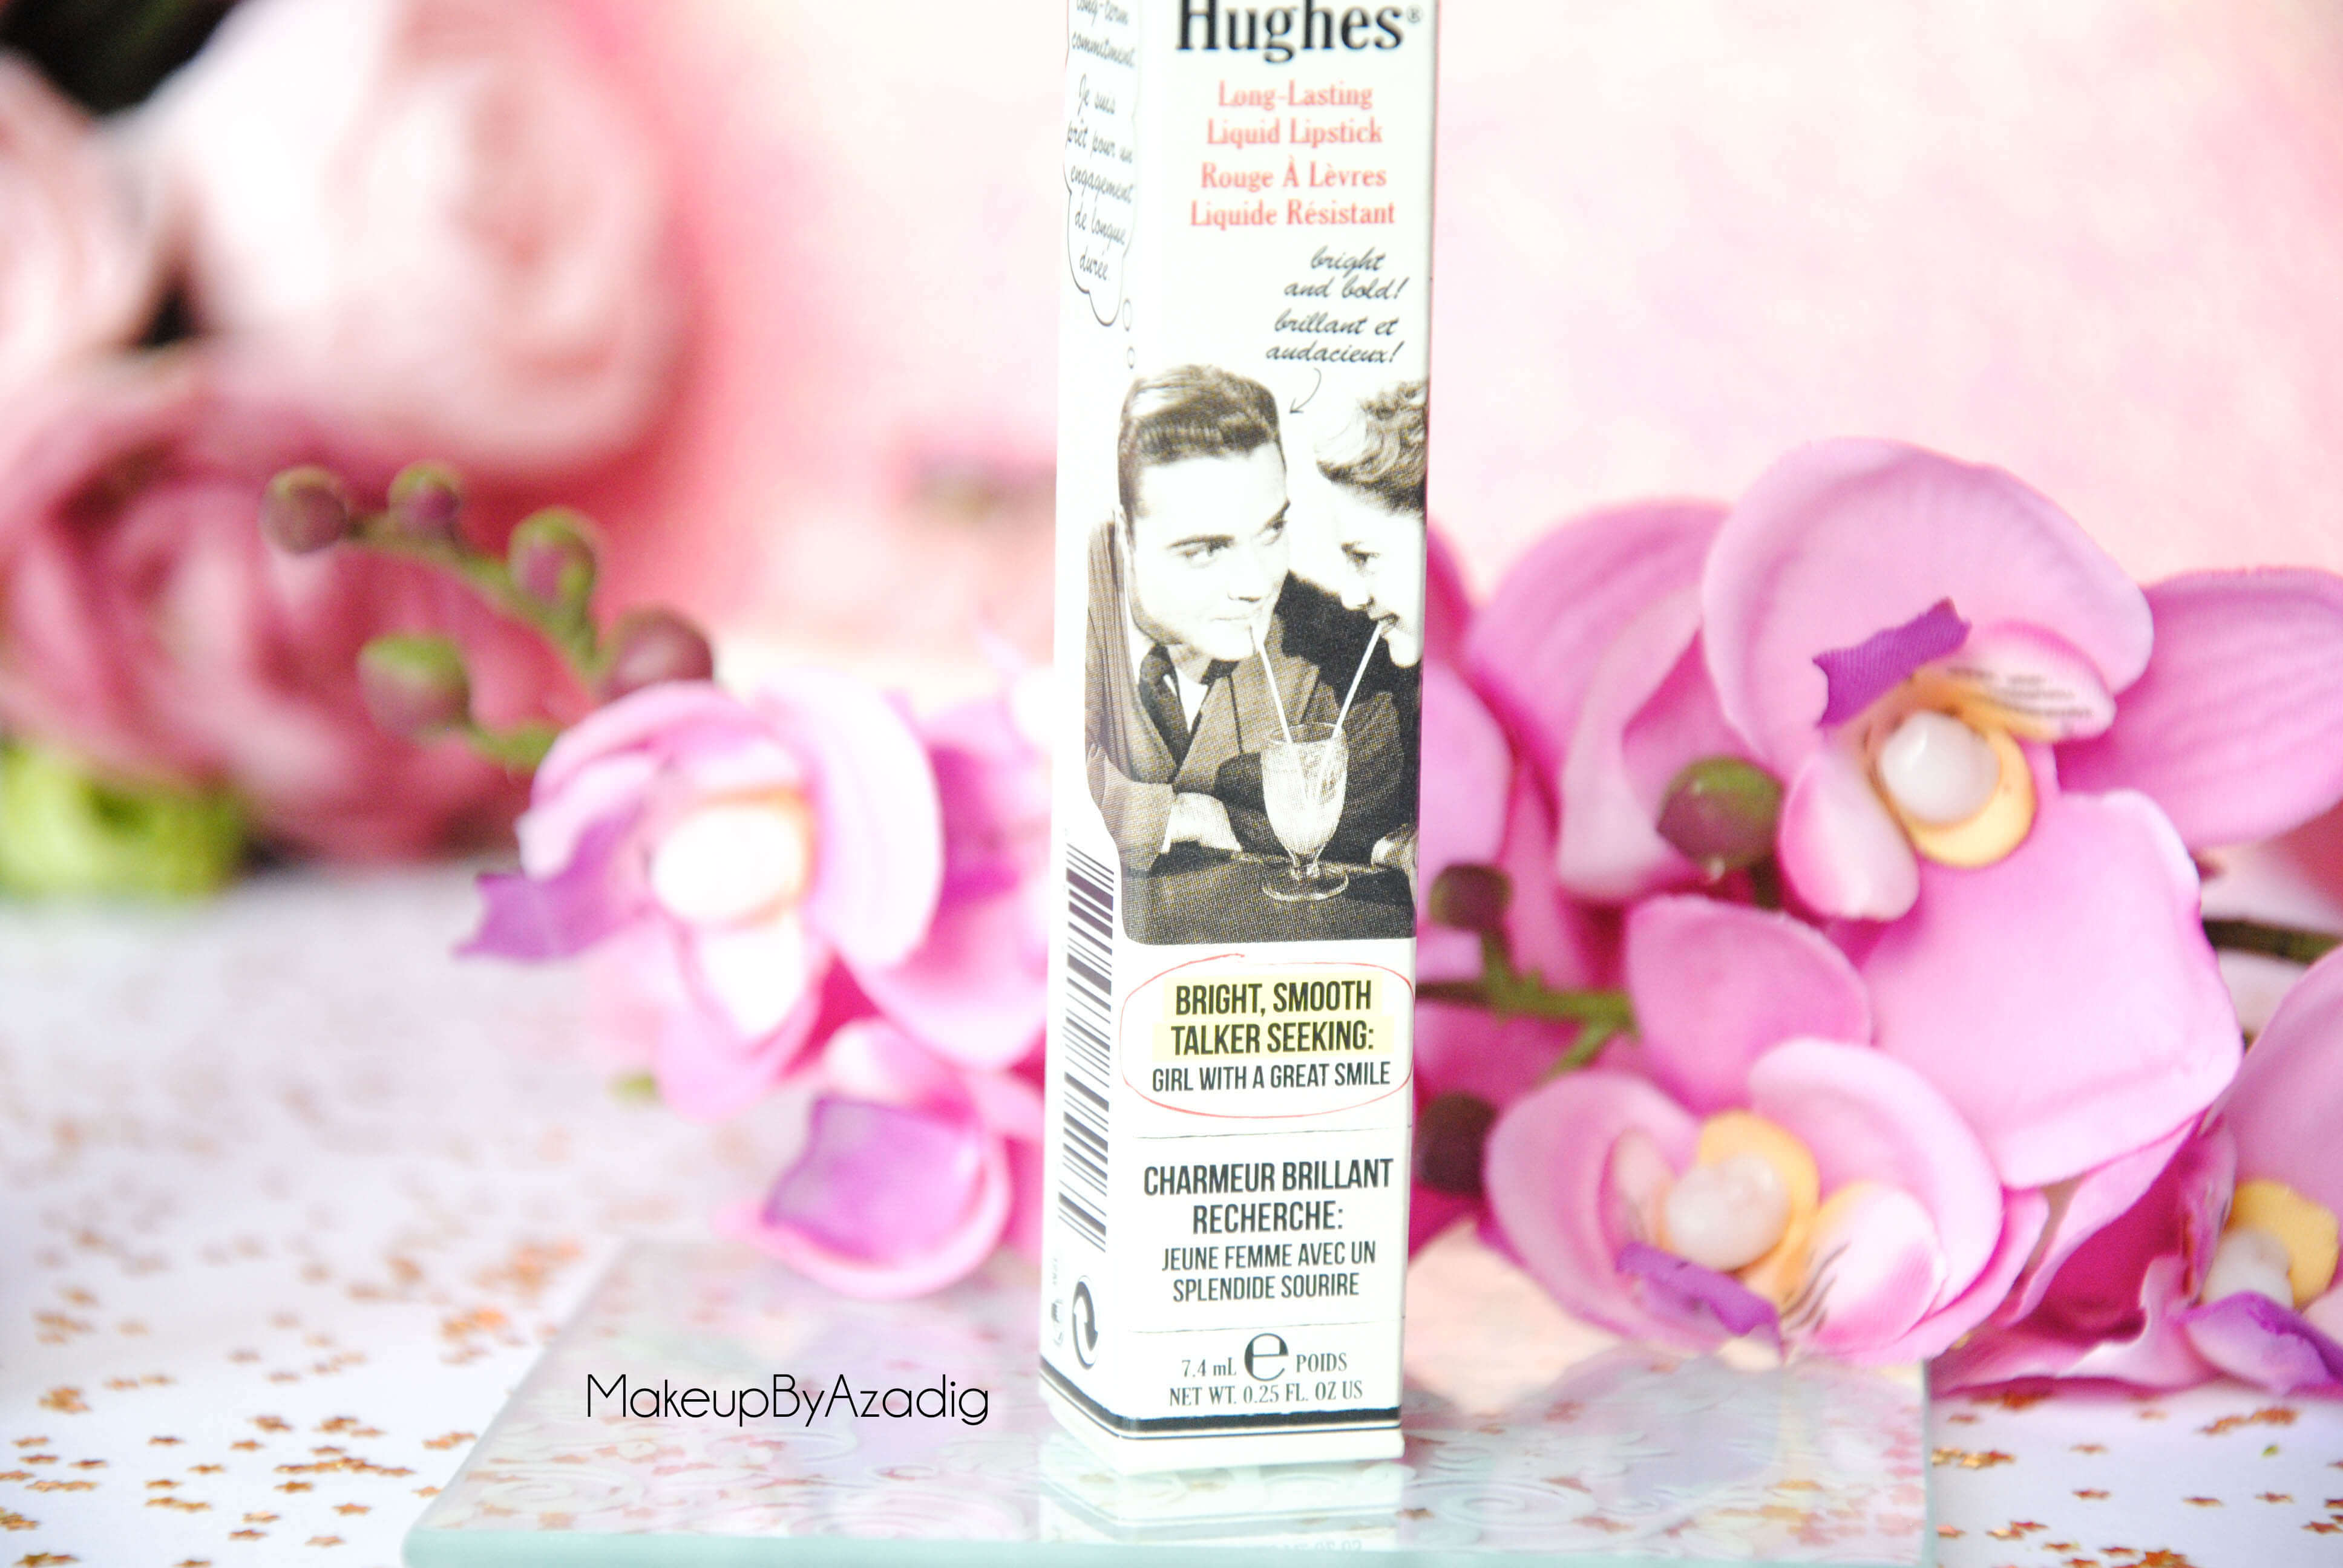 meet-matte-hughes-the-balm-charming-makeupbyazadig-troyes-paris-rouge-levres-liquide-swatch-review-avis-love